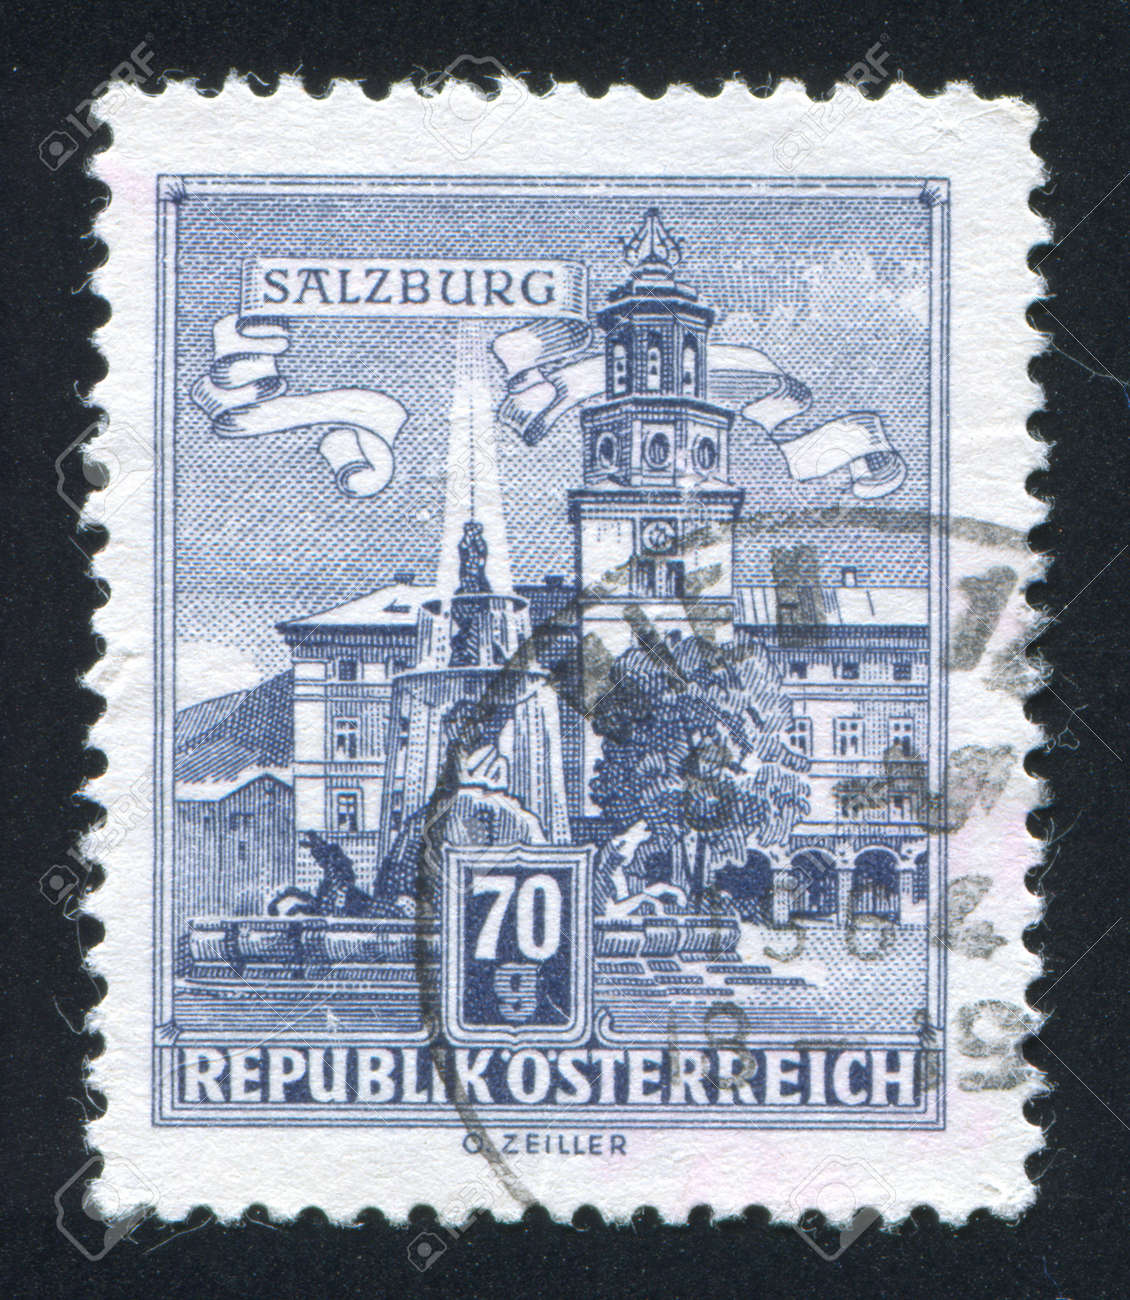 AUSTRIA - CIRCA 1957: stamp printed by Austria, shows Residenz Fountain, Salzburg, circa 1957 Stock Photo - 17809673